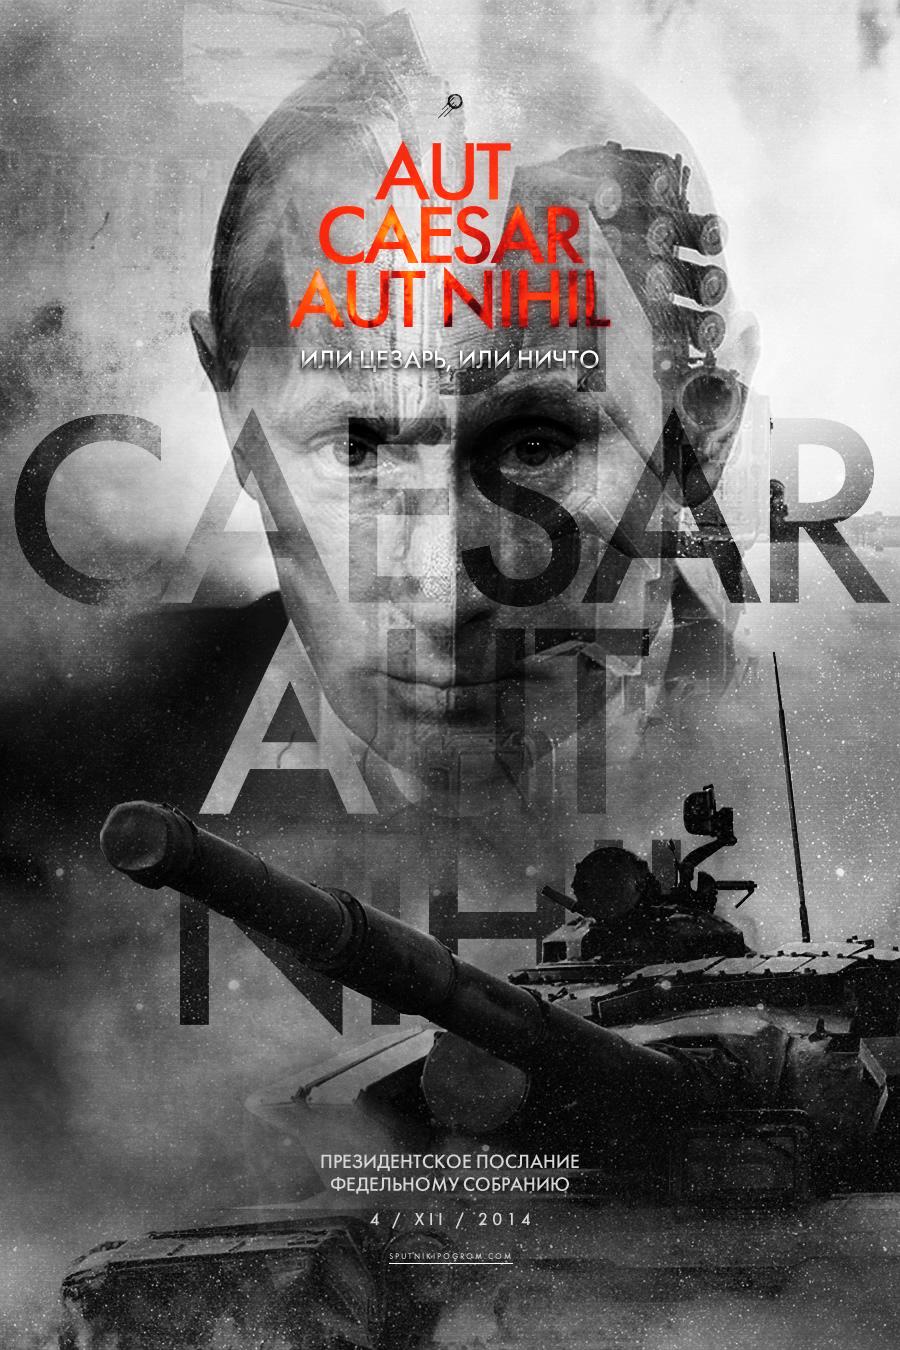 caesarf